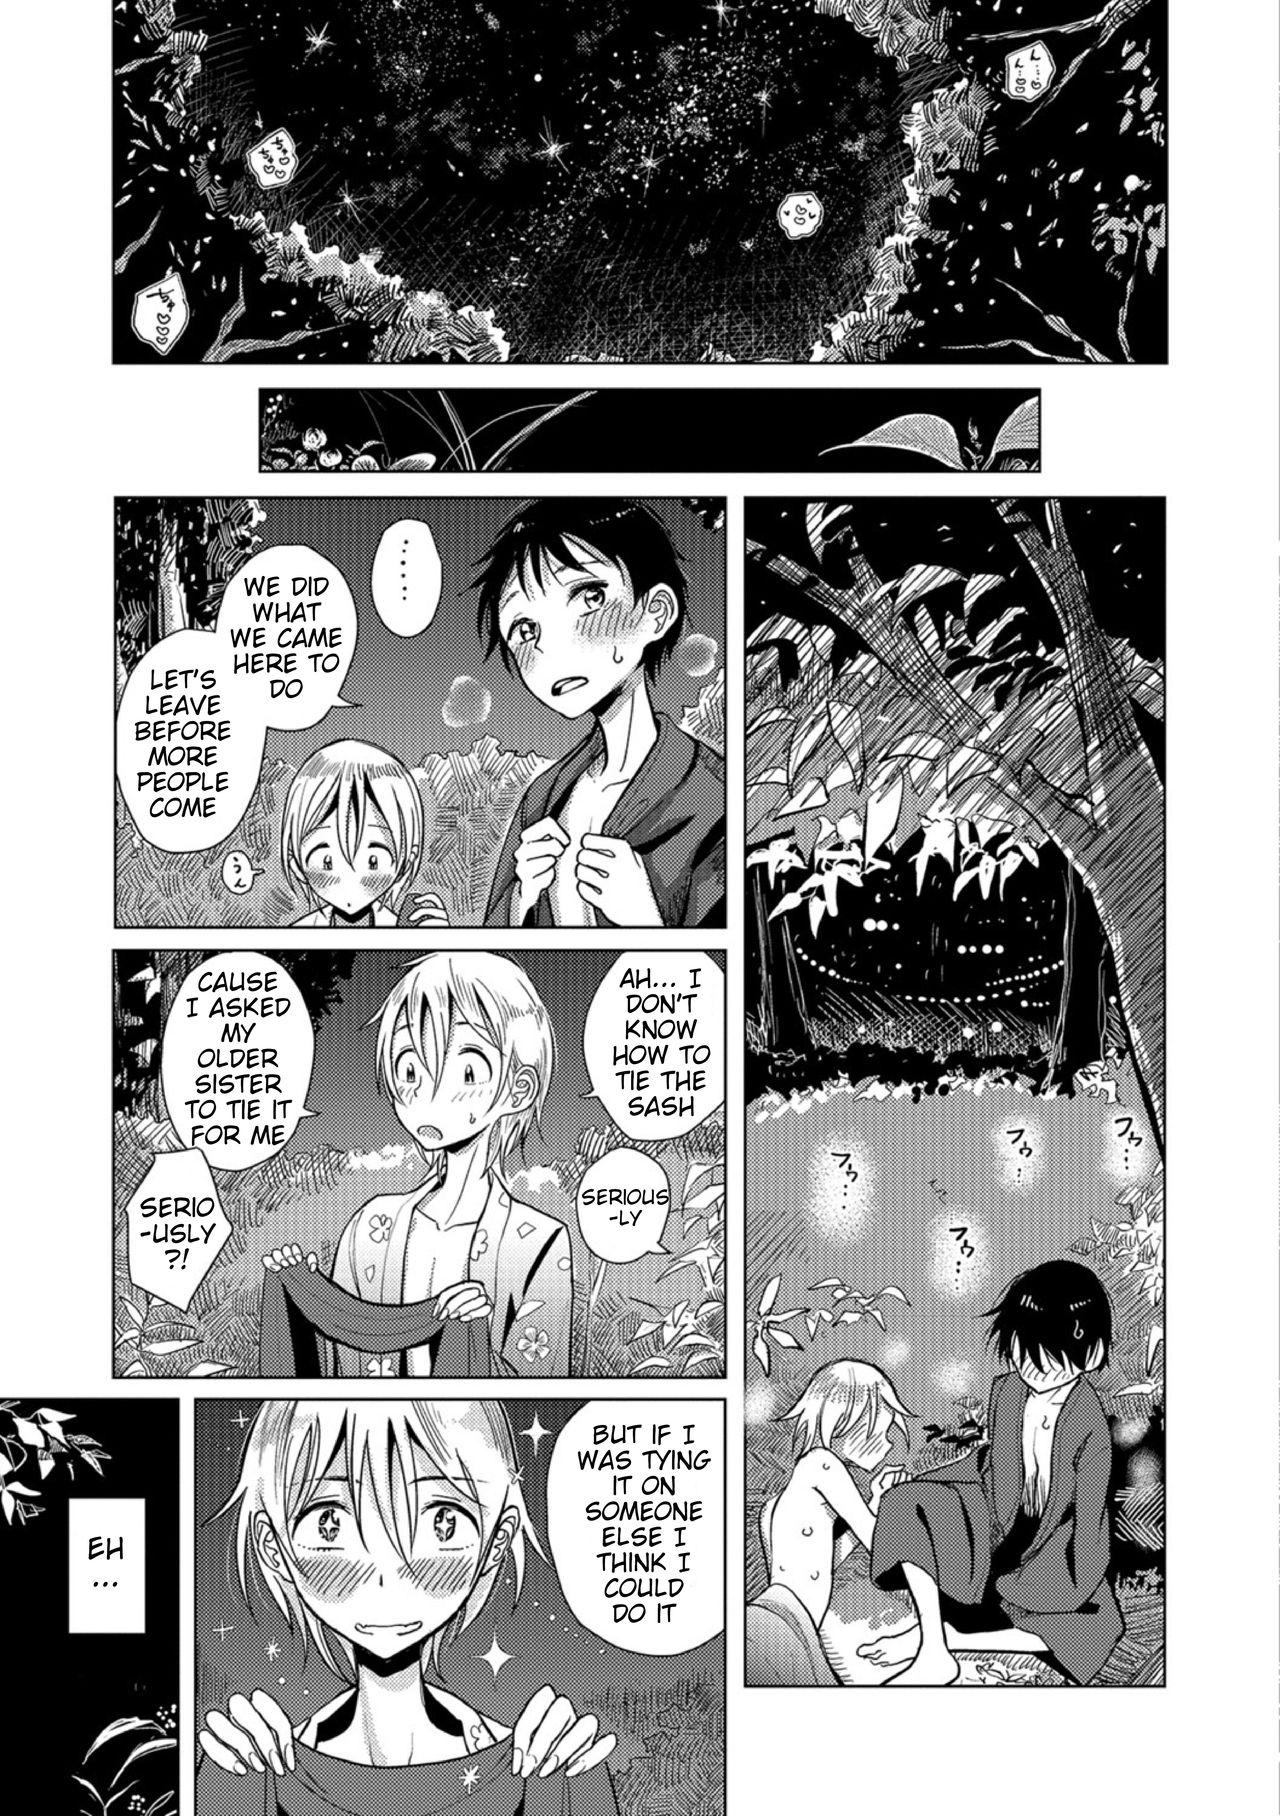 Hibana 14